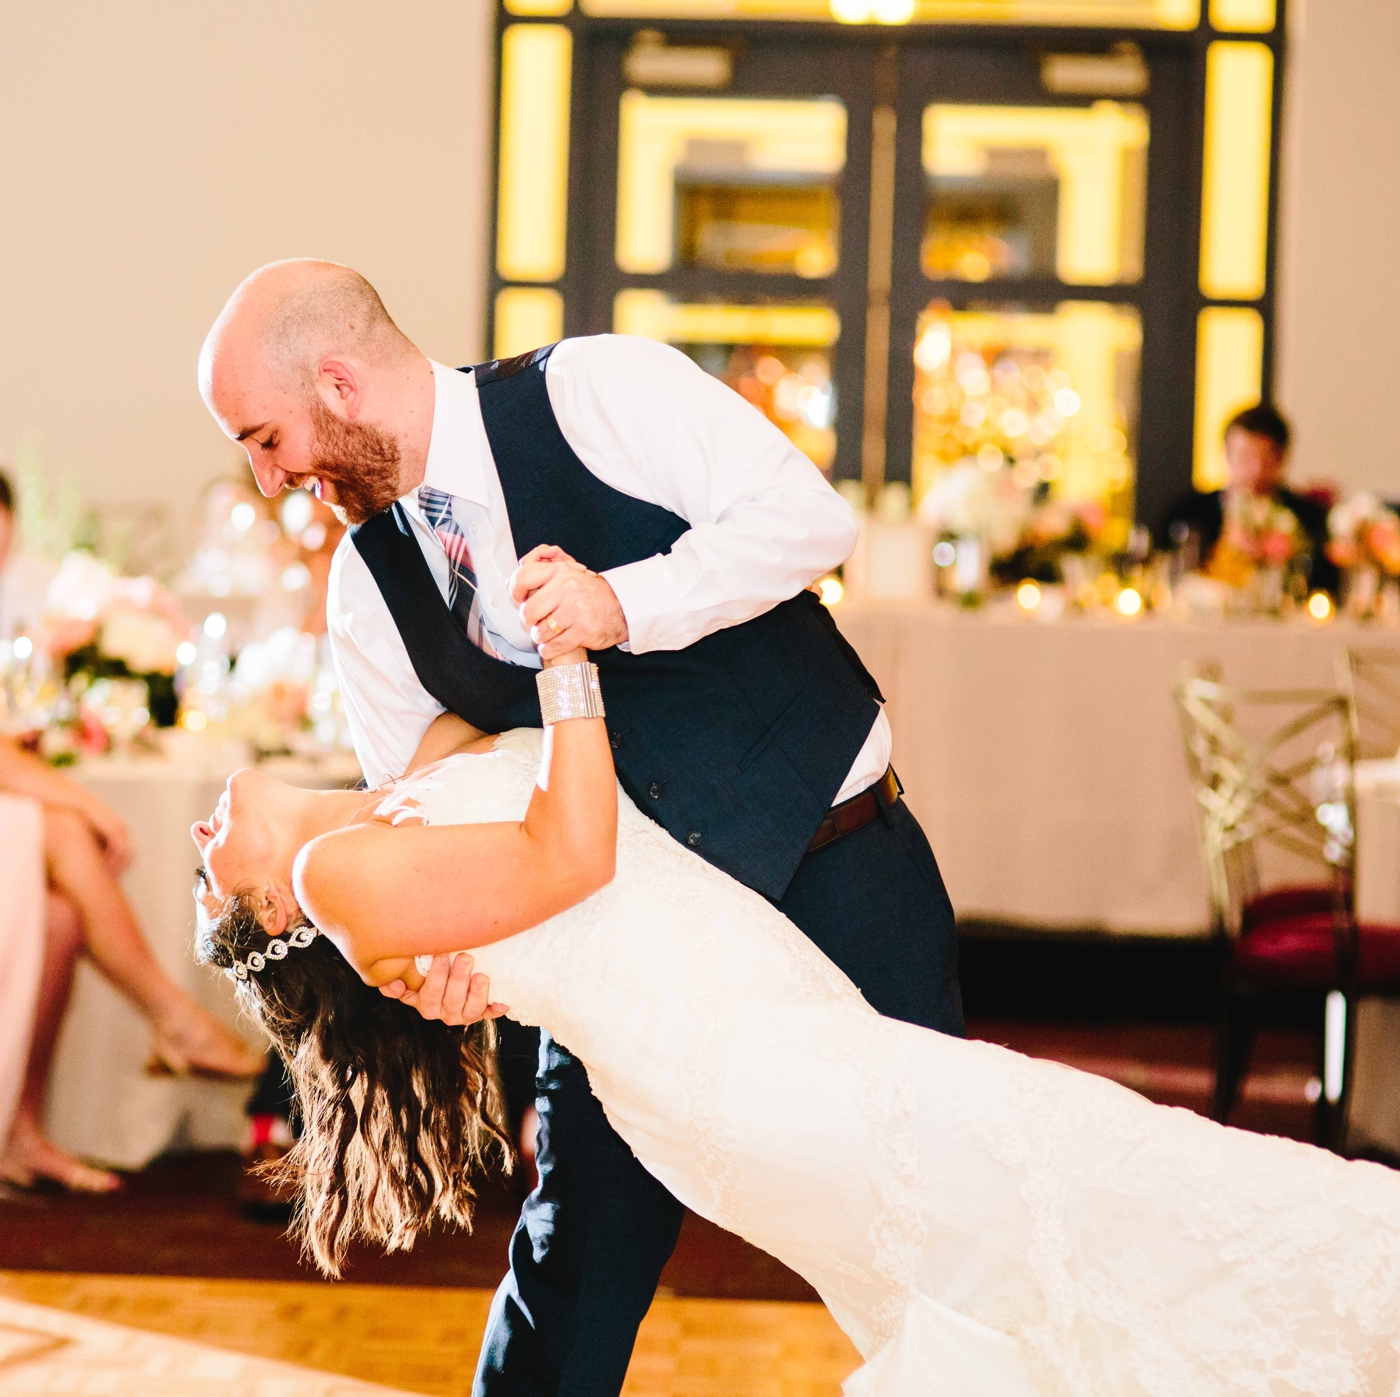 chicago-fine-art-wedding-photography-svihra25